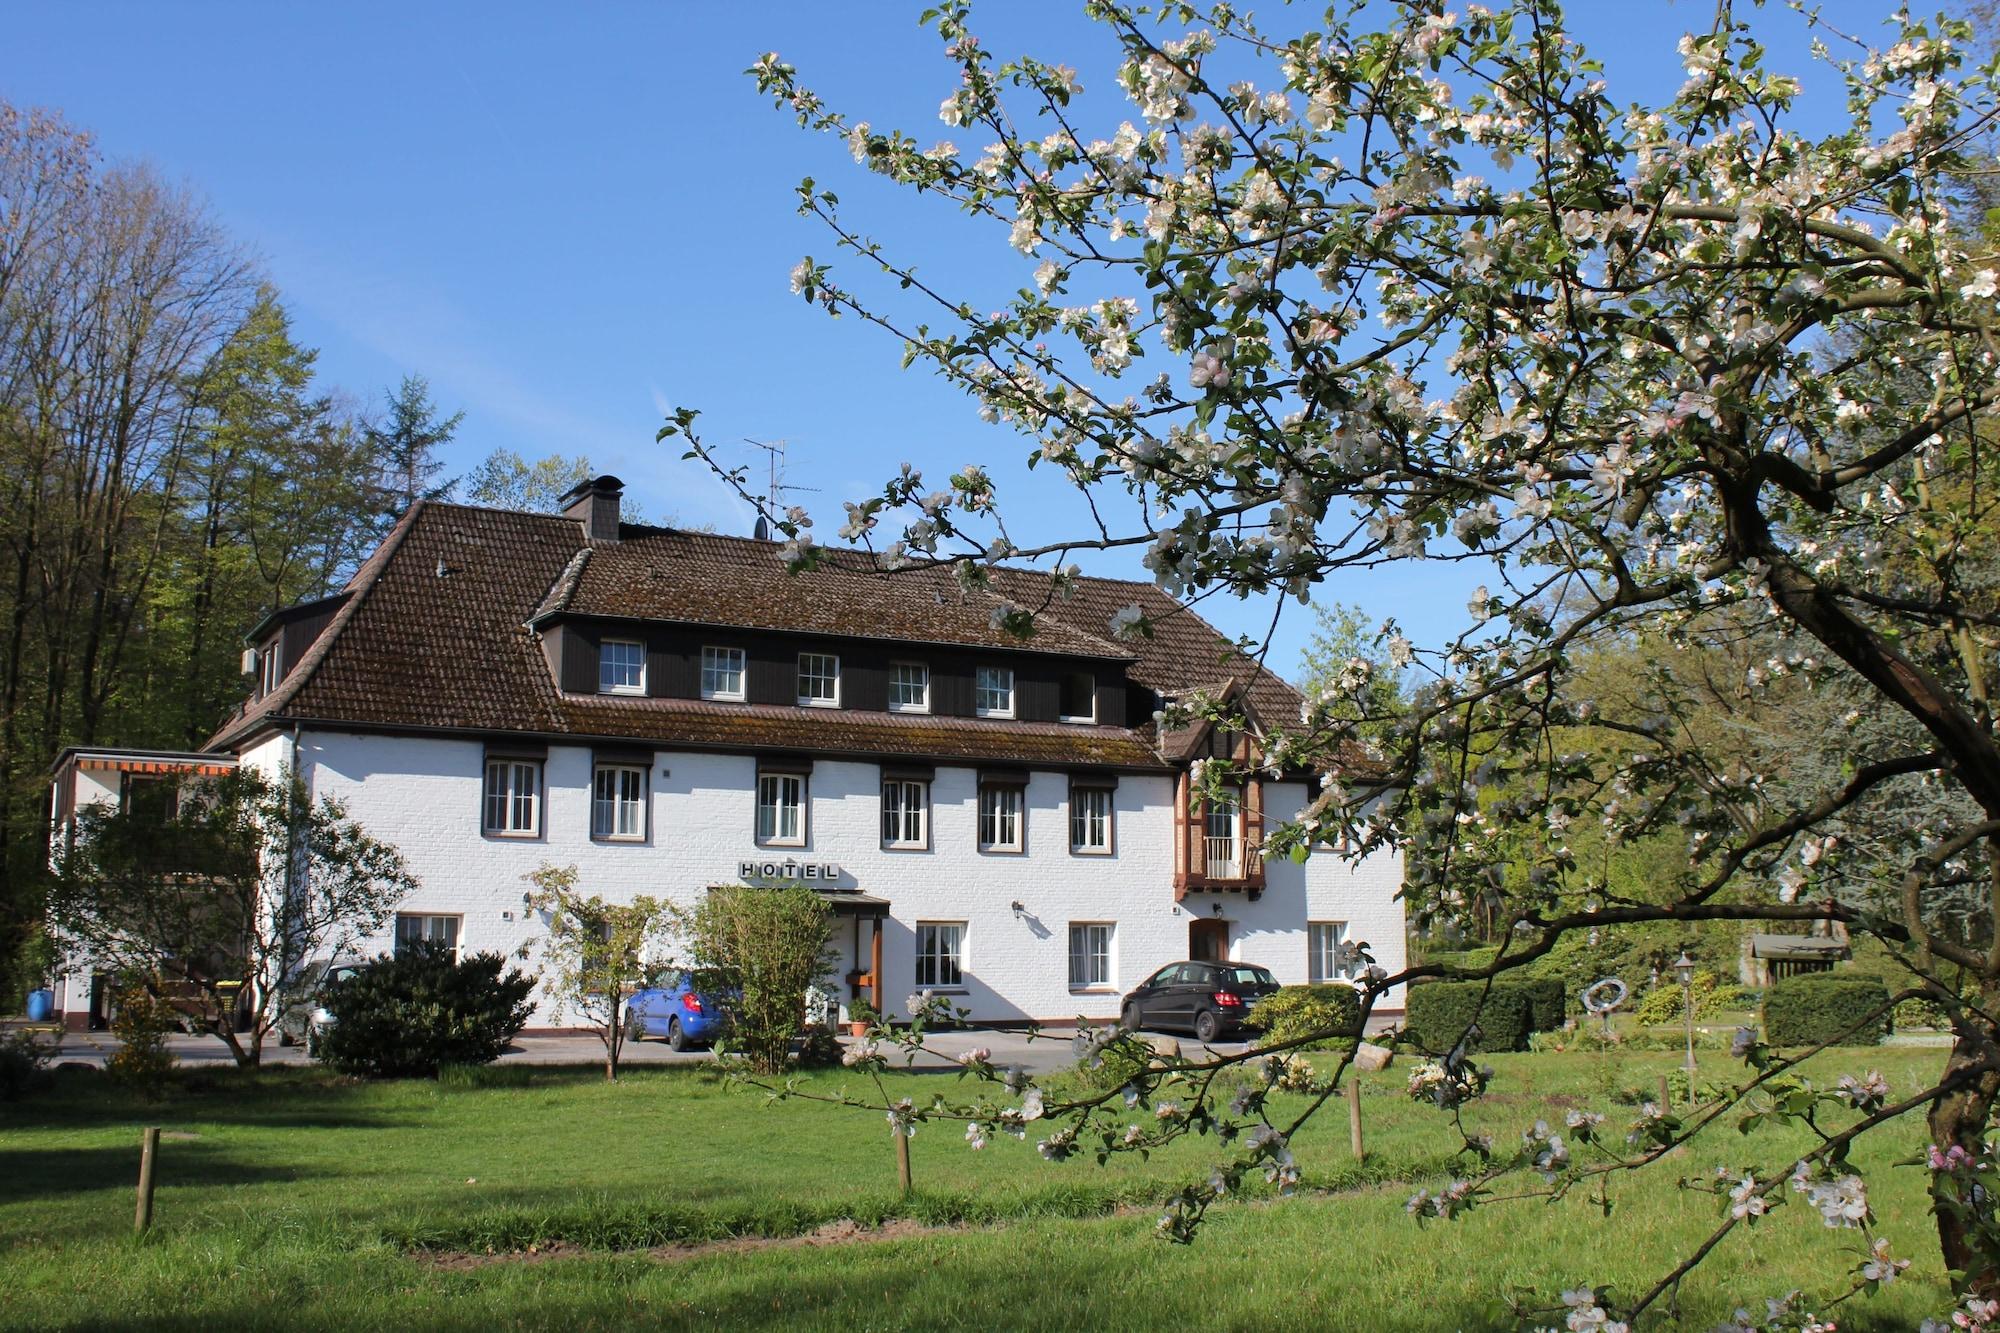 Hotel Wintersmühle, Bielefeld